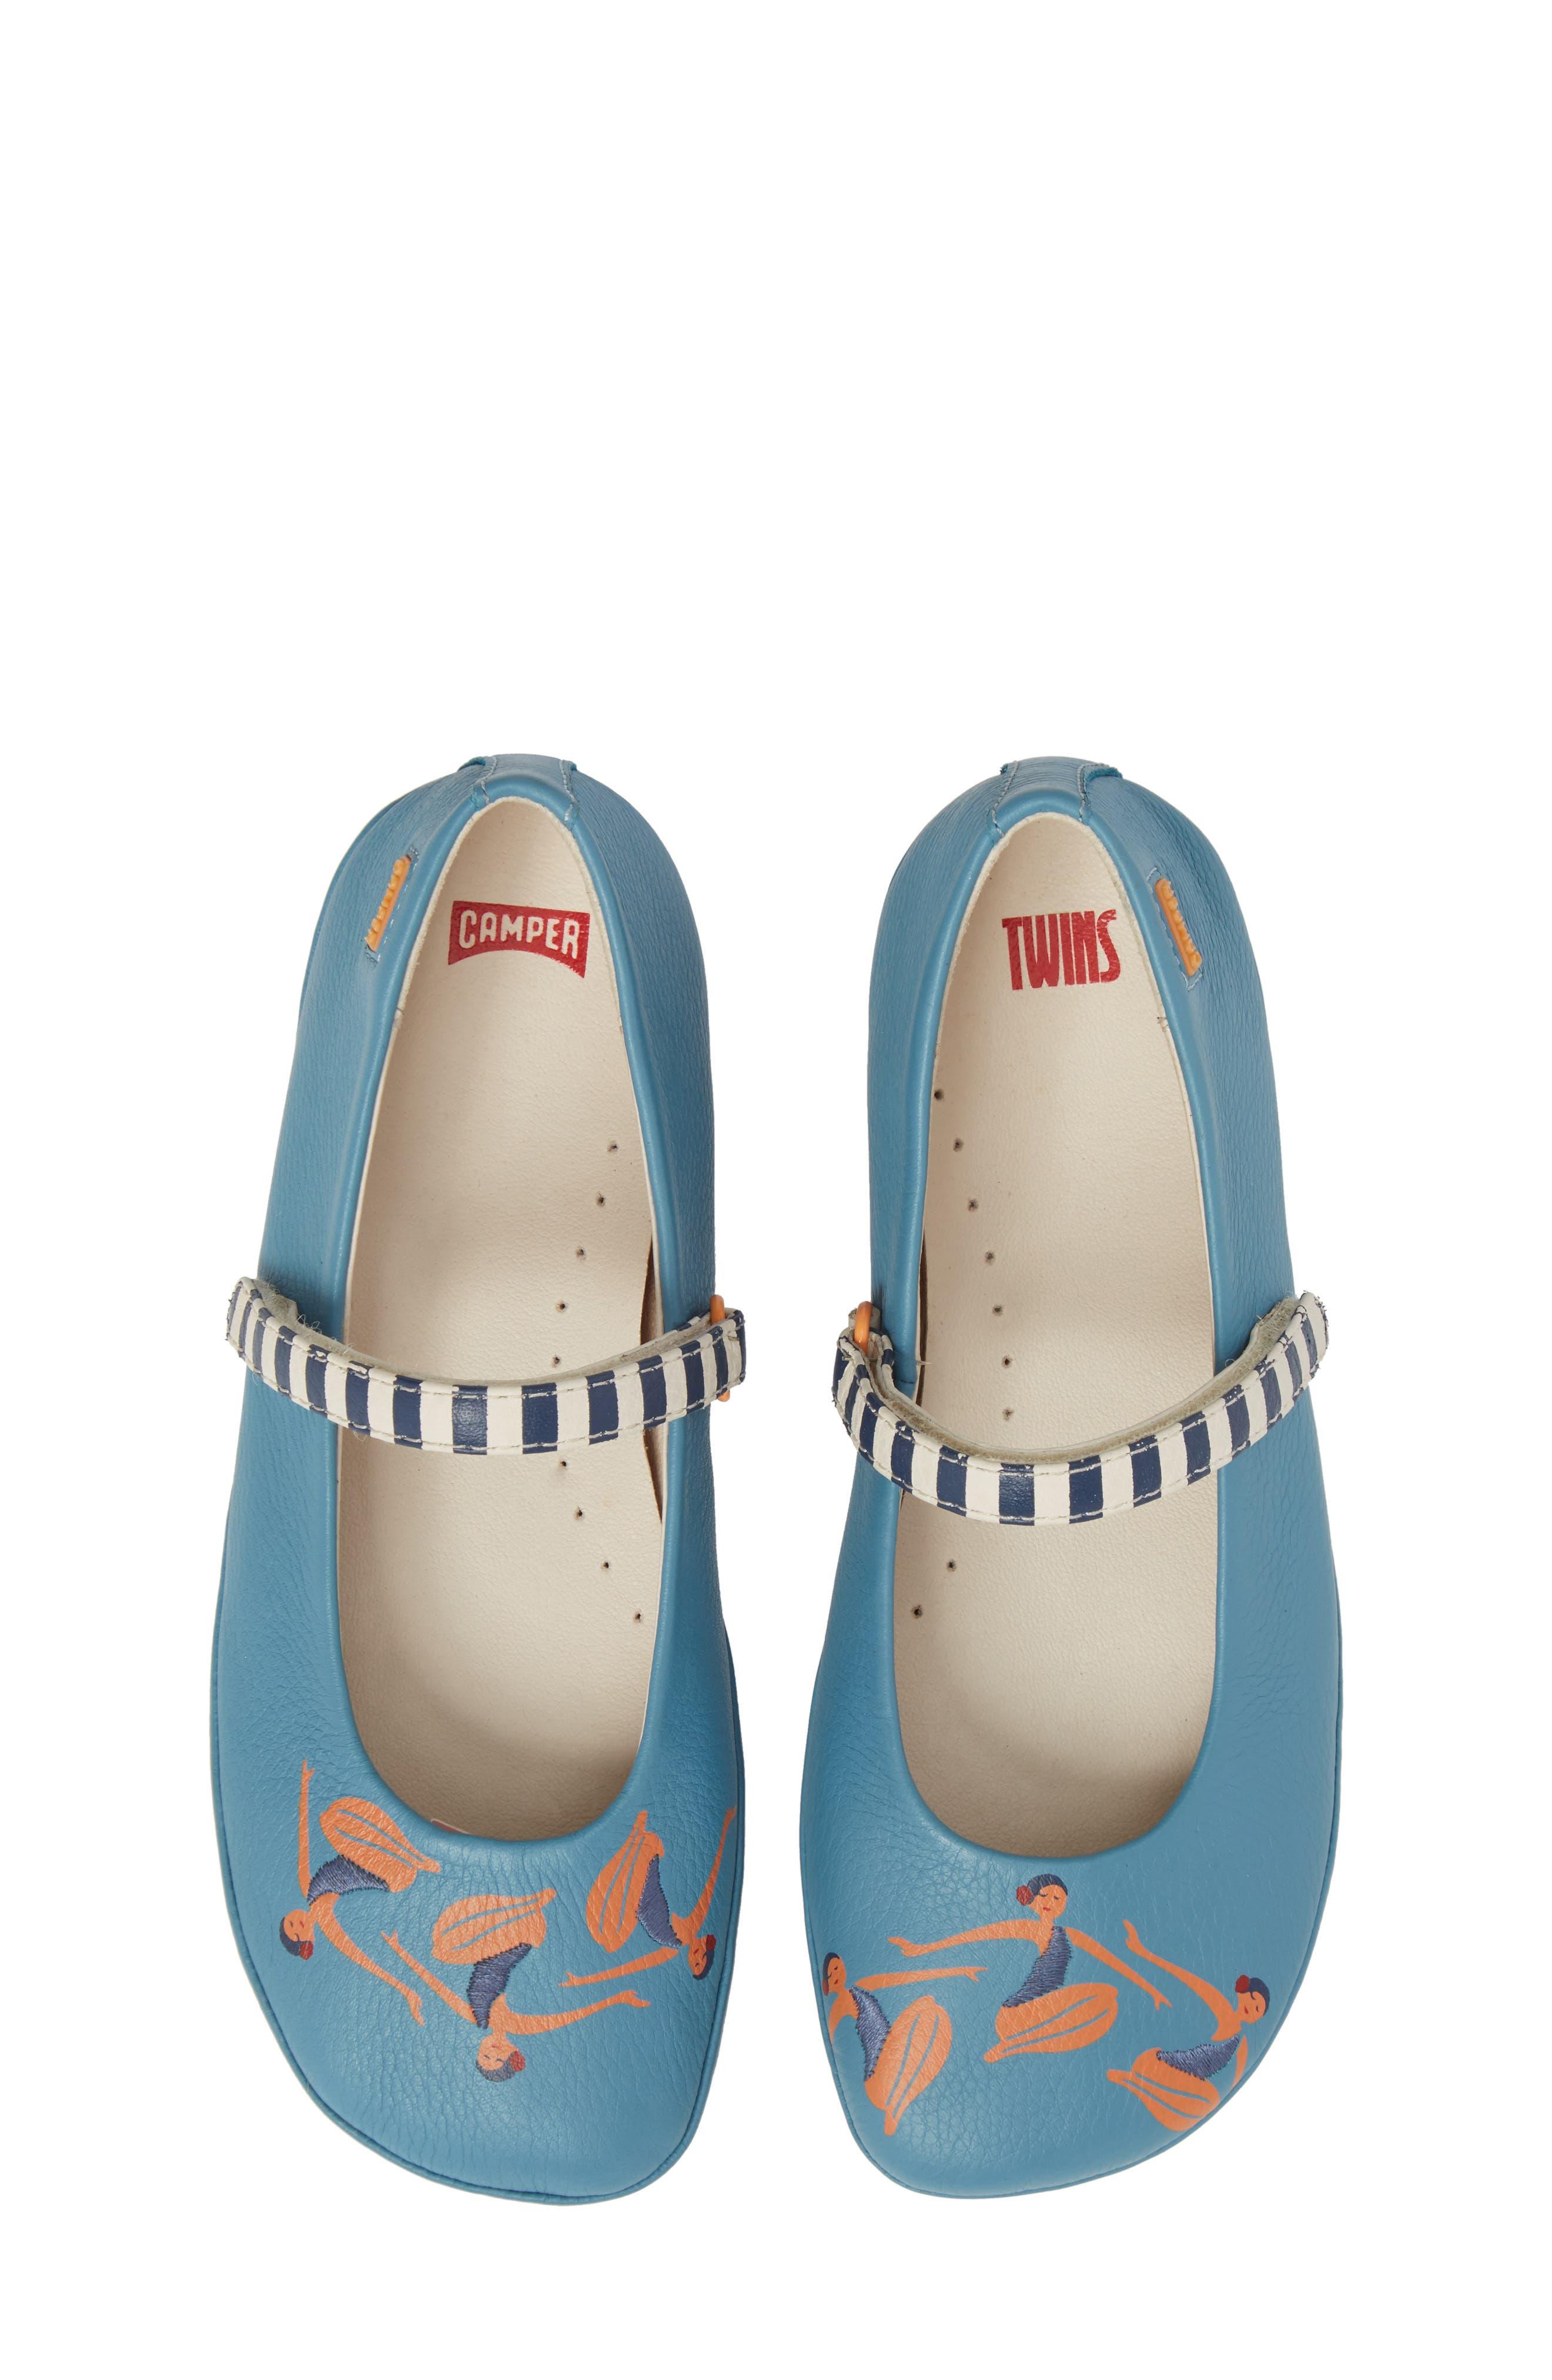 Twins Mary Jane Flat,                         Main,                         color, Blue